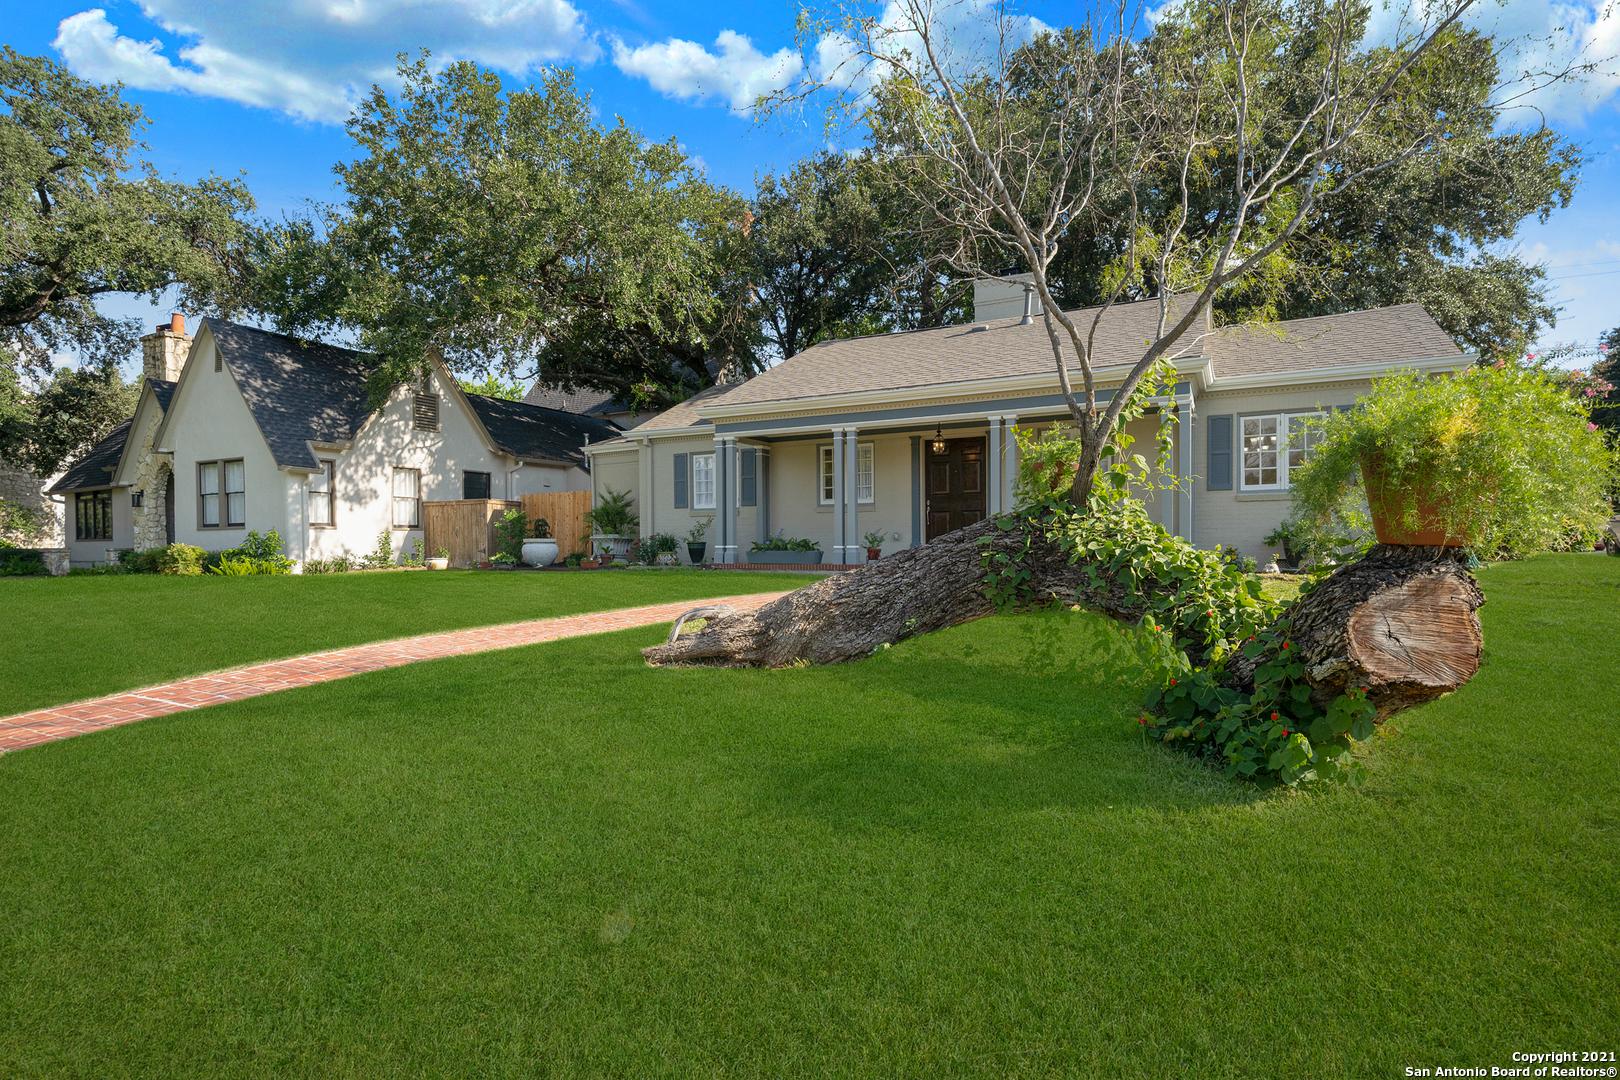 240 W Lullwood Ave, San Antonio, TX 78212